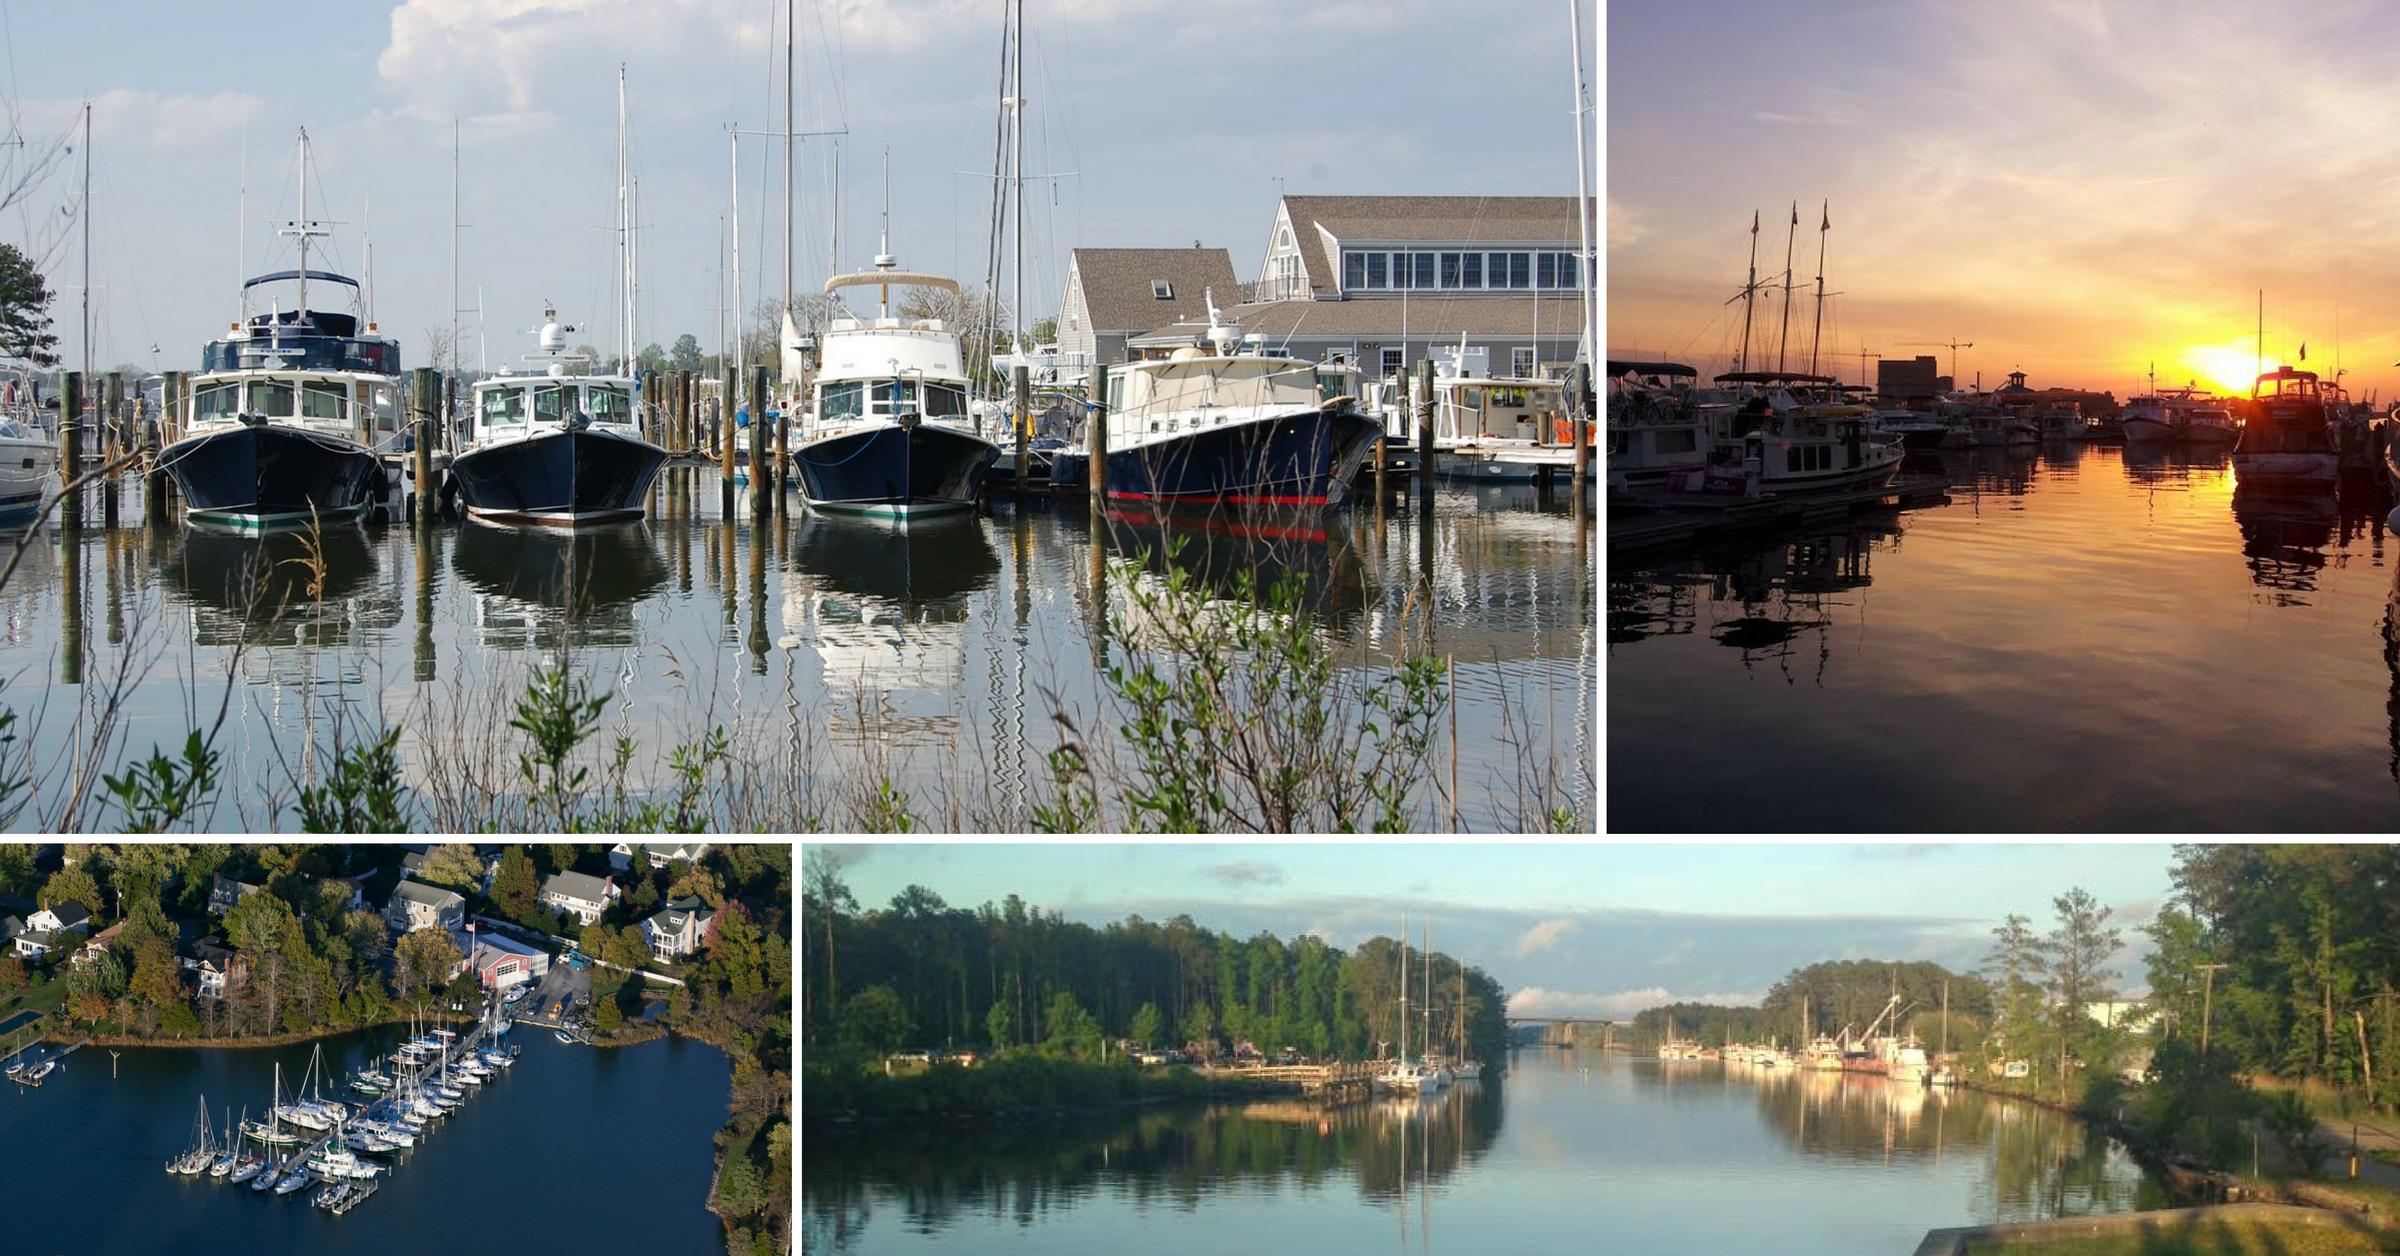 Chesapeake Bay Boaters: Reserve Slips and Moorings at 8 New Dockwa Marinas